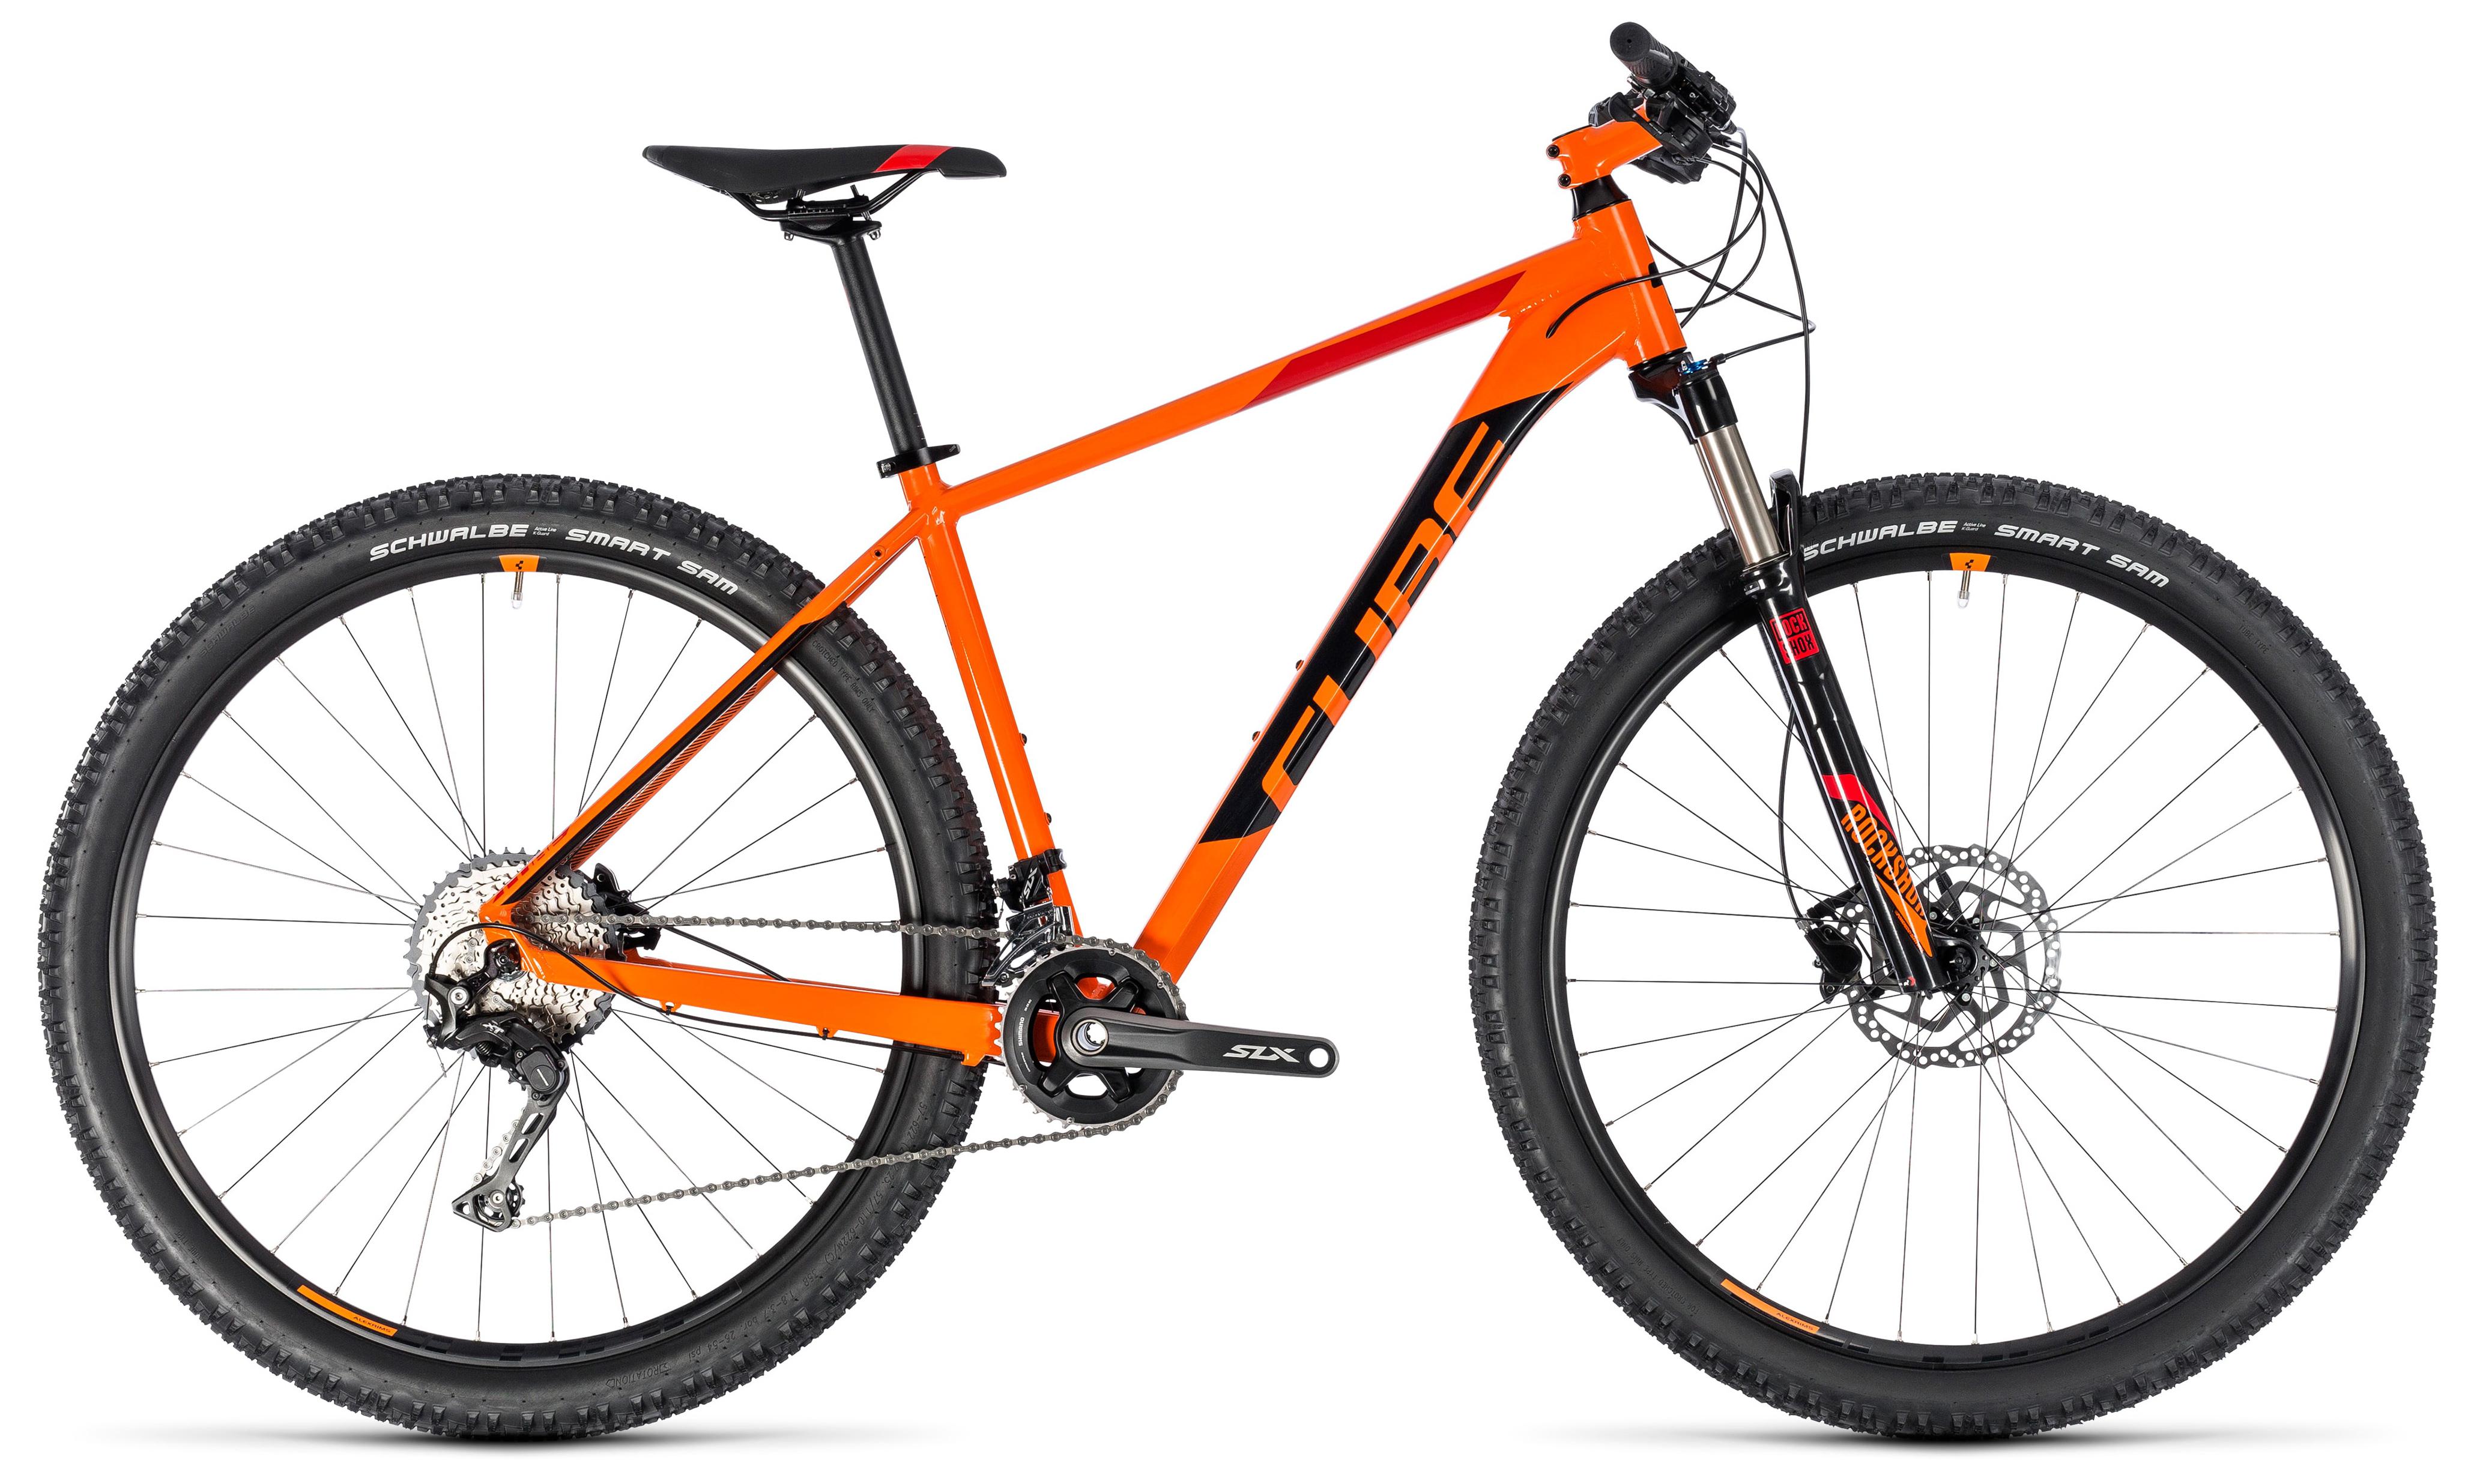 Велосипед Cube Acid SE 29 2018 велосипед cube analog 29 2015